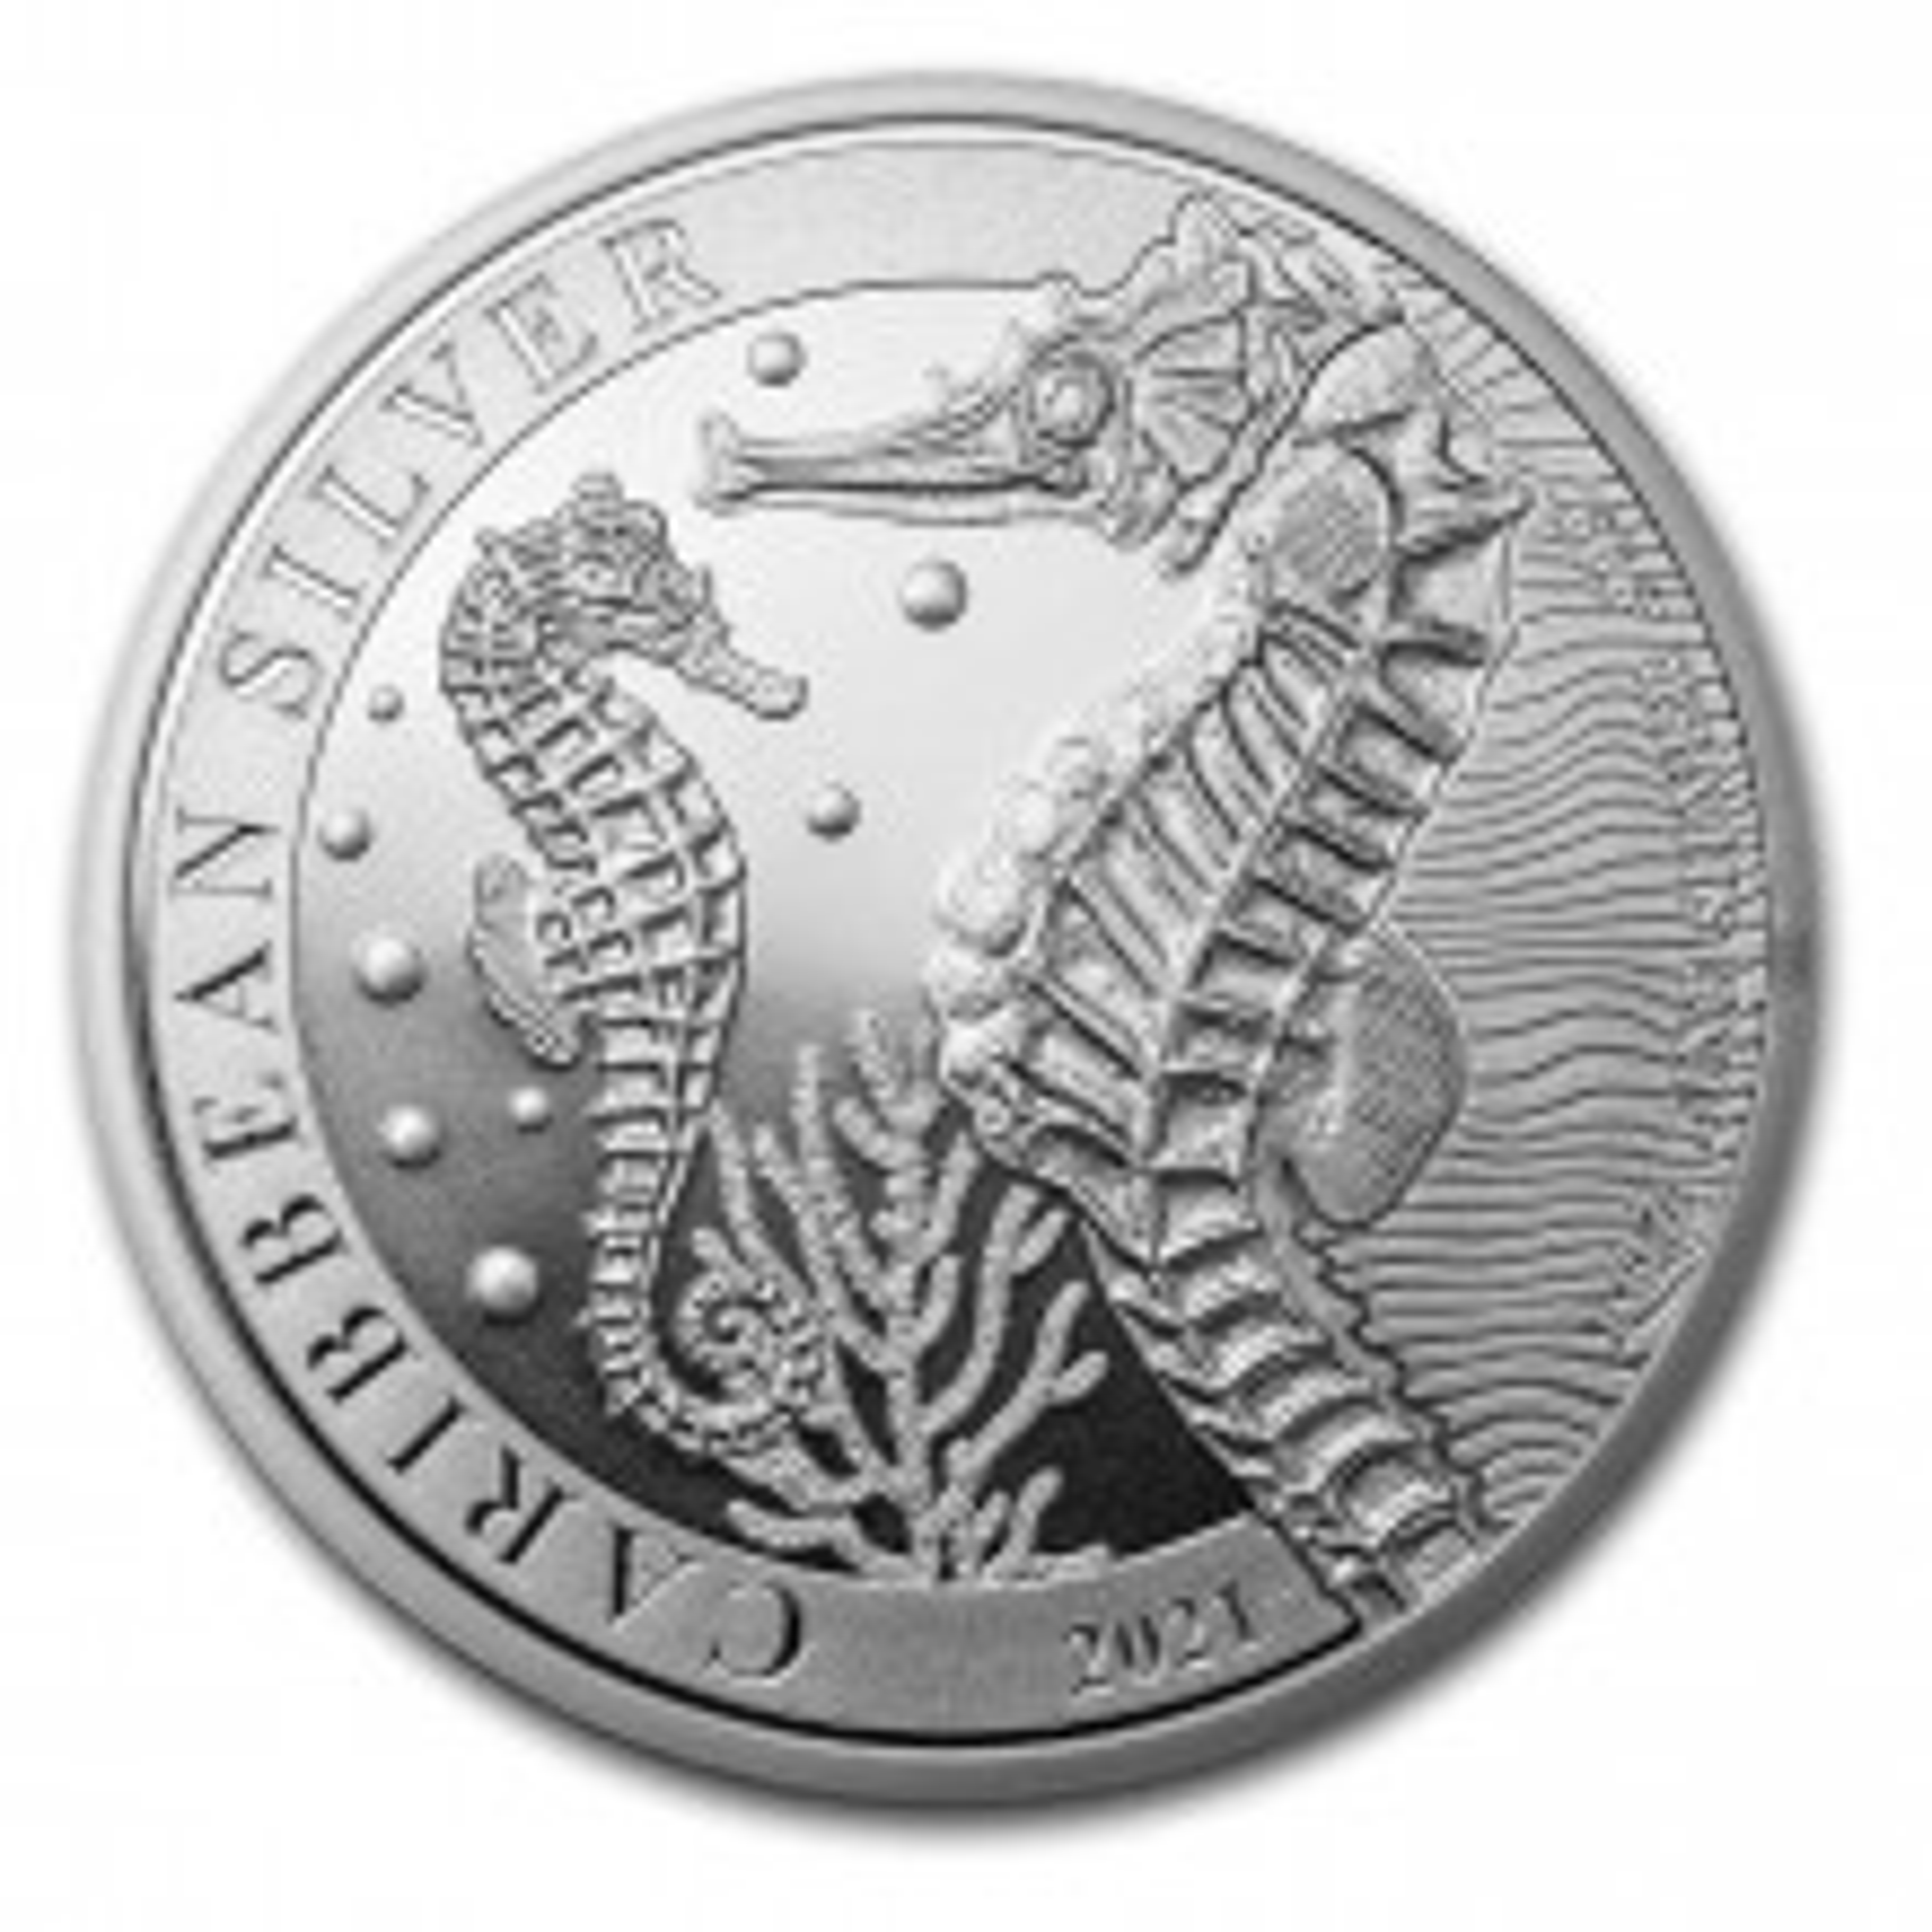 1 troy ounce zilveren munt Caribbean Seahorse 2021